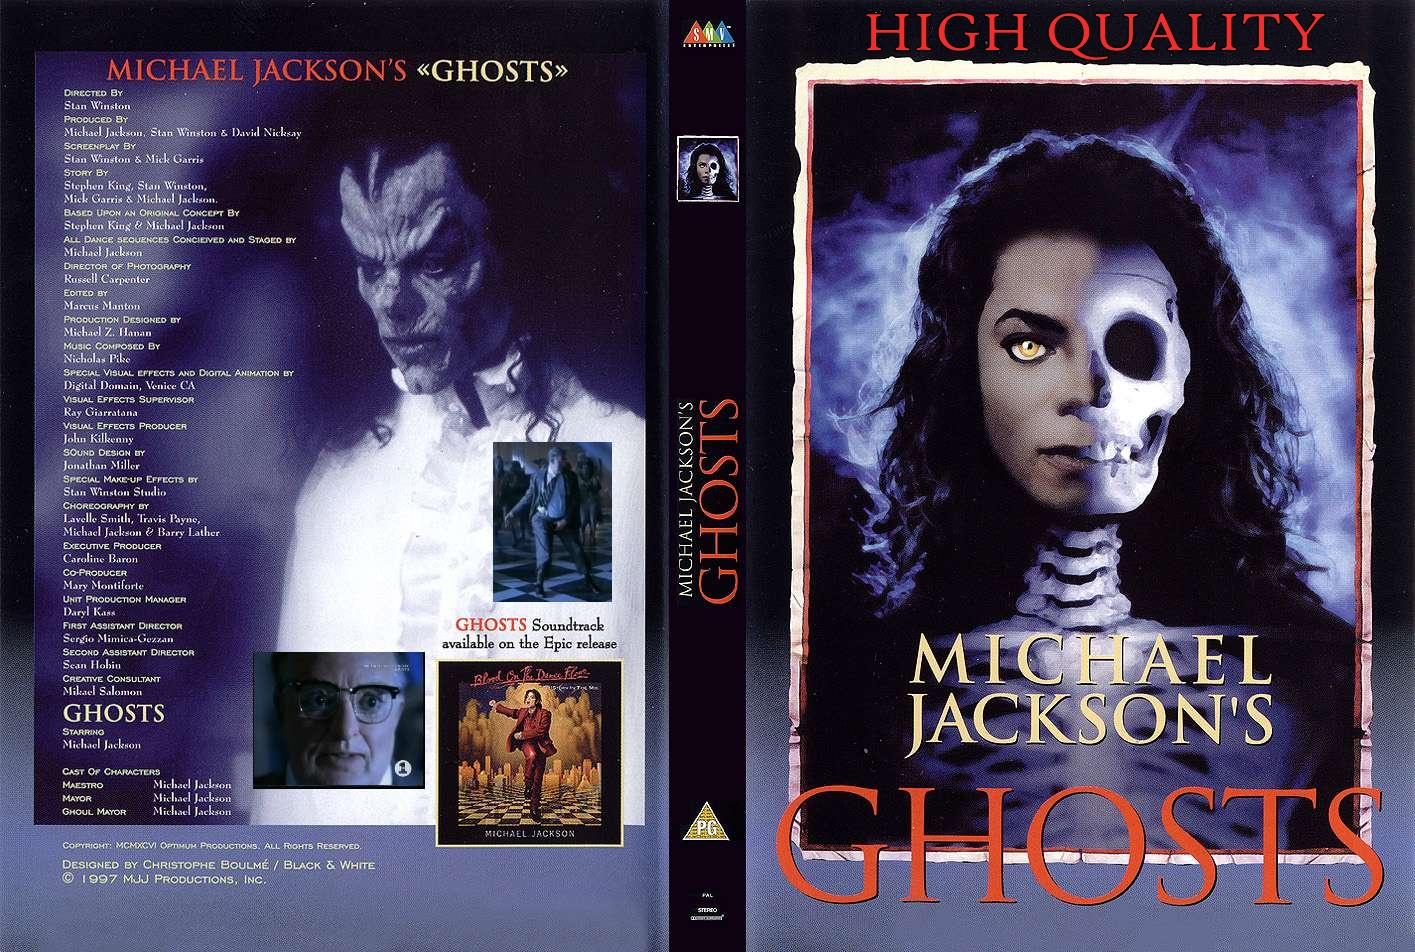 http://1.bp.blogspot.com/_u_22hnwm6Qk/TIPA9Tb219I/AAAAAAAABas/9PD3ze3lMGw/s1600/Michael+Jackson+-+DVD+Oficiales+-+Ghost_06+%5BBy+Richard+Jackson+-+MJJLatino.Net%5D.jpg